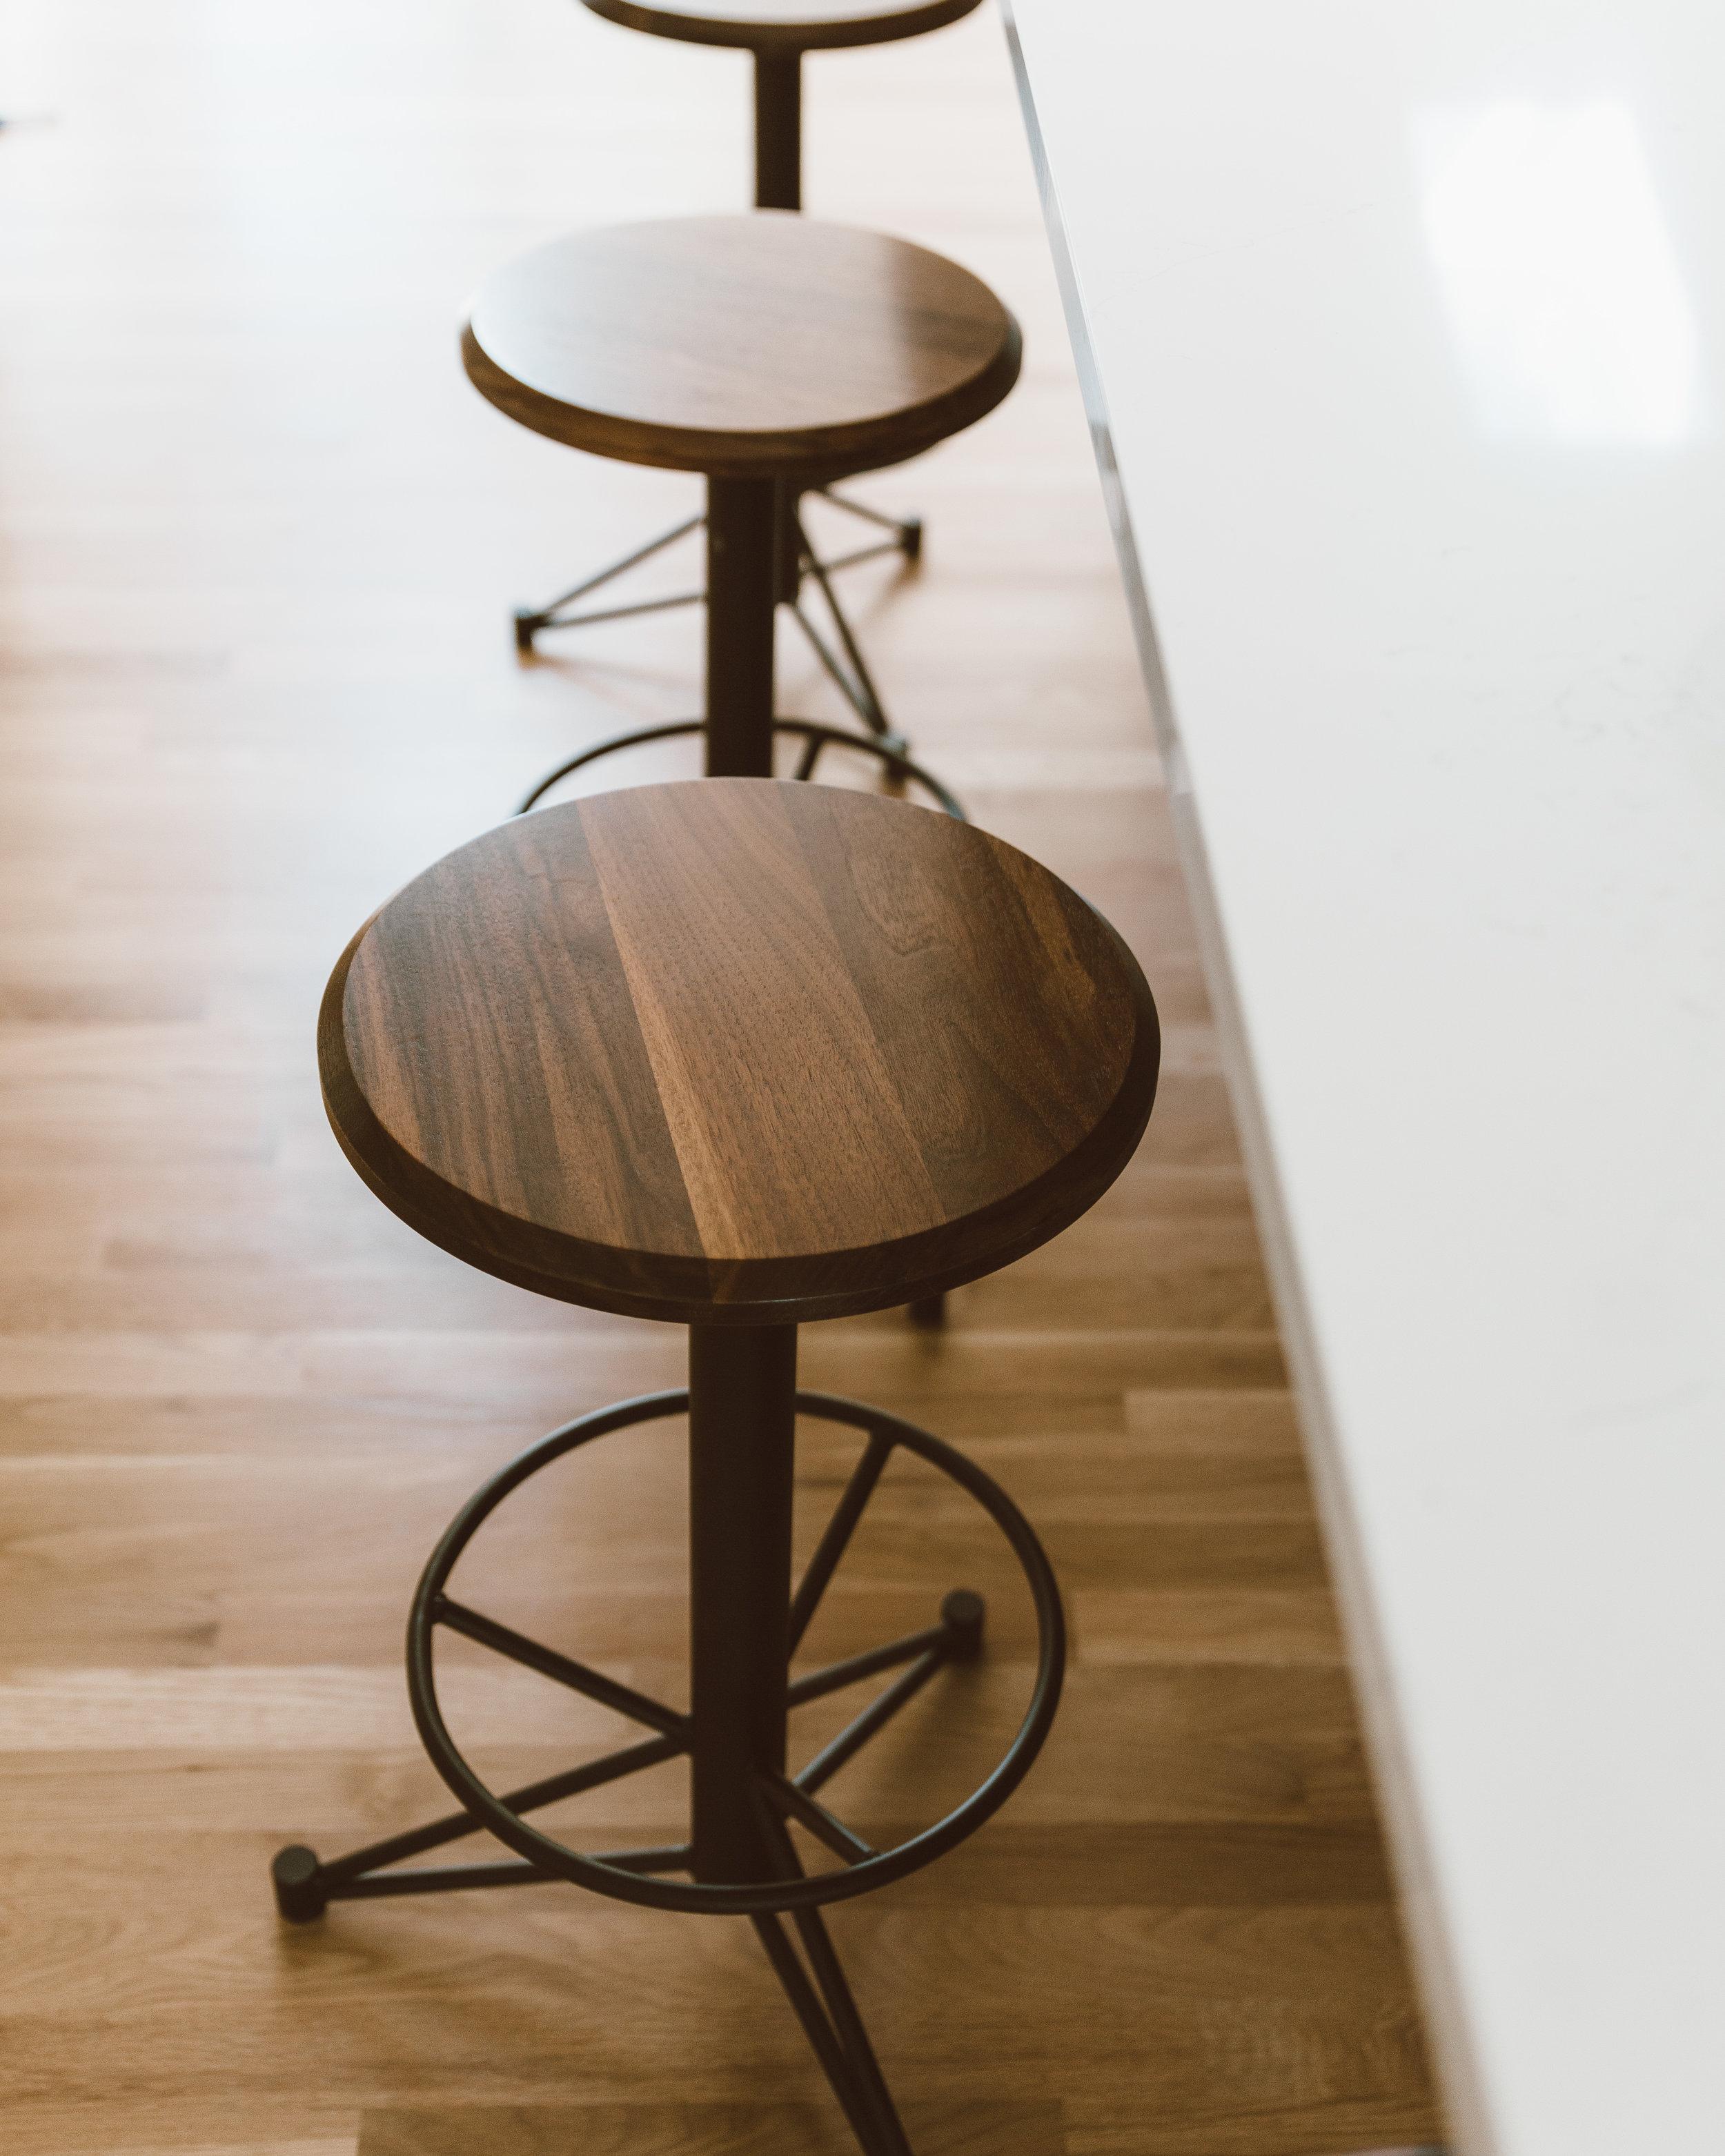 forthehome-edgework-creative-stoolskitchen02.jpg